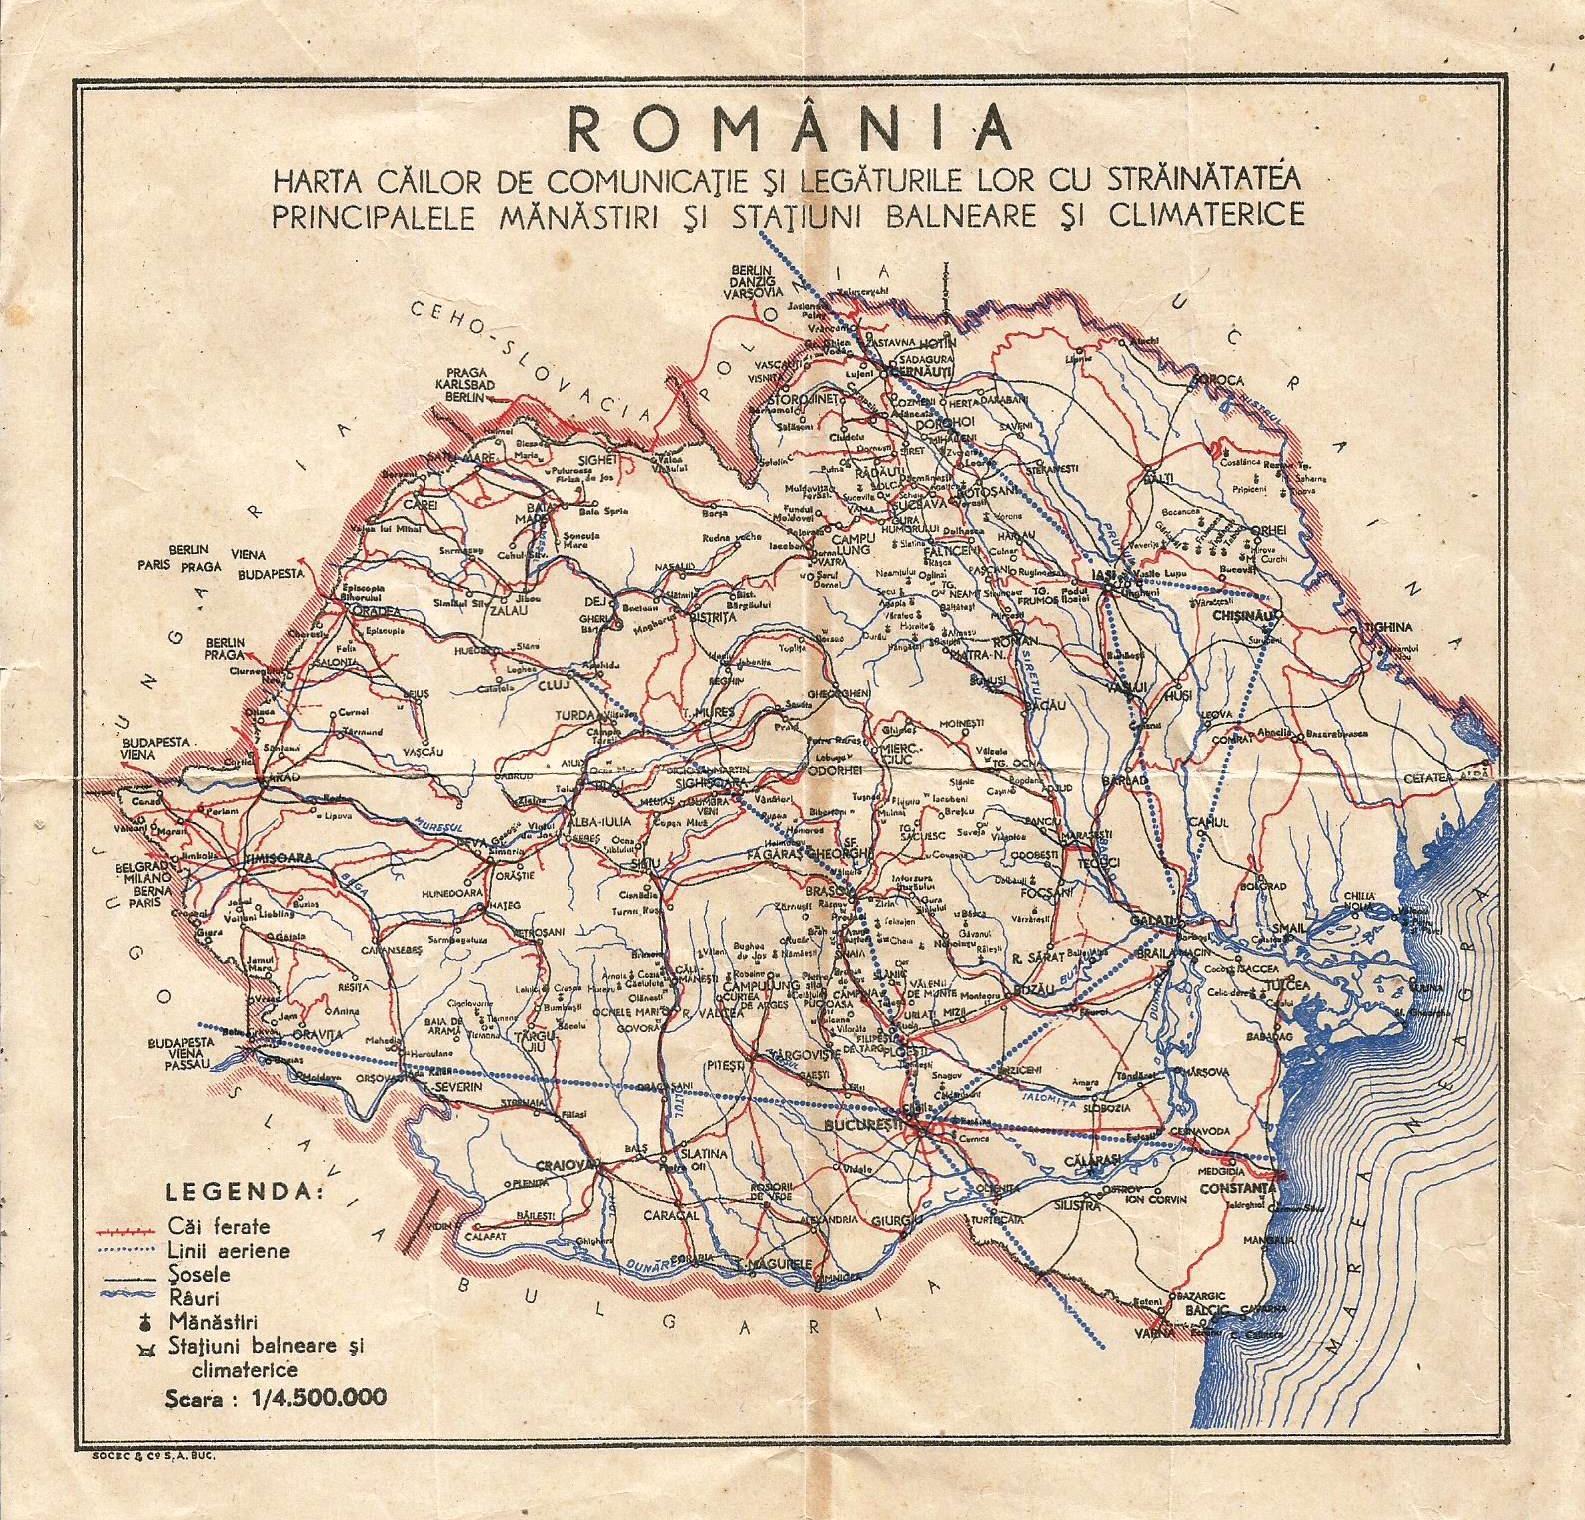 Harta.jpg